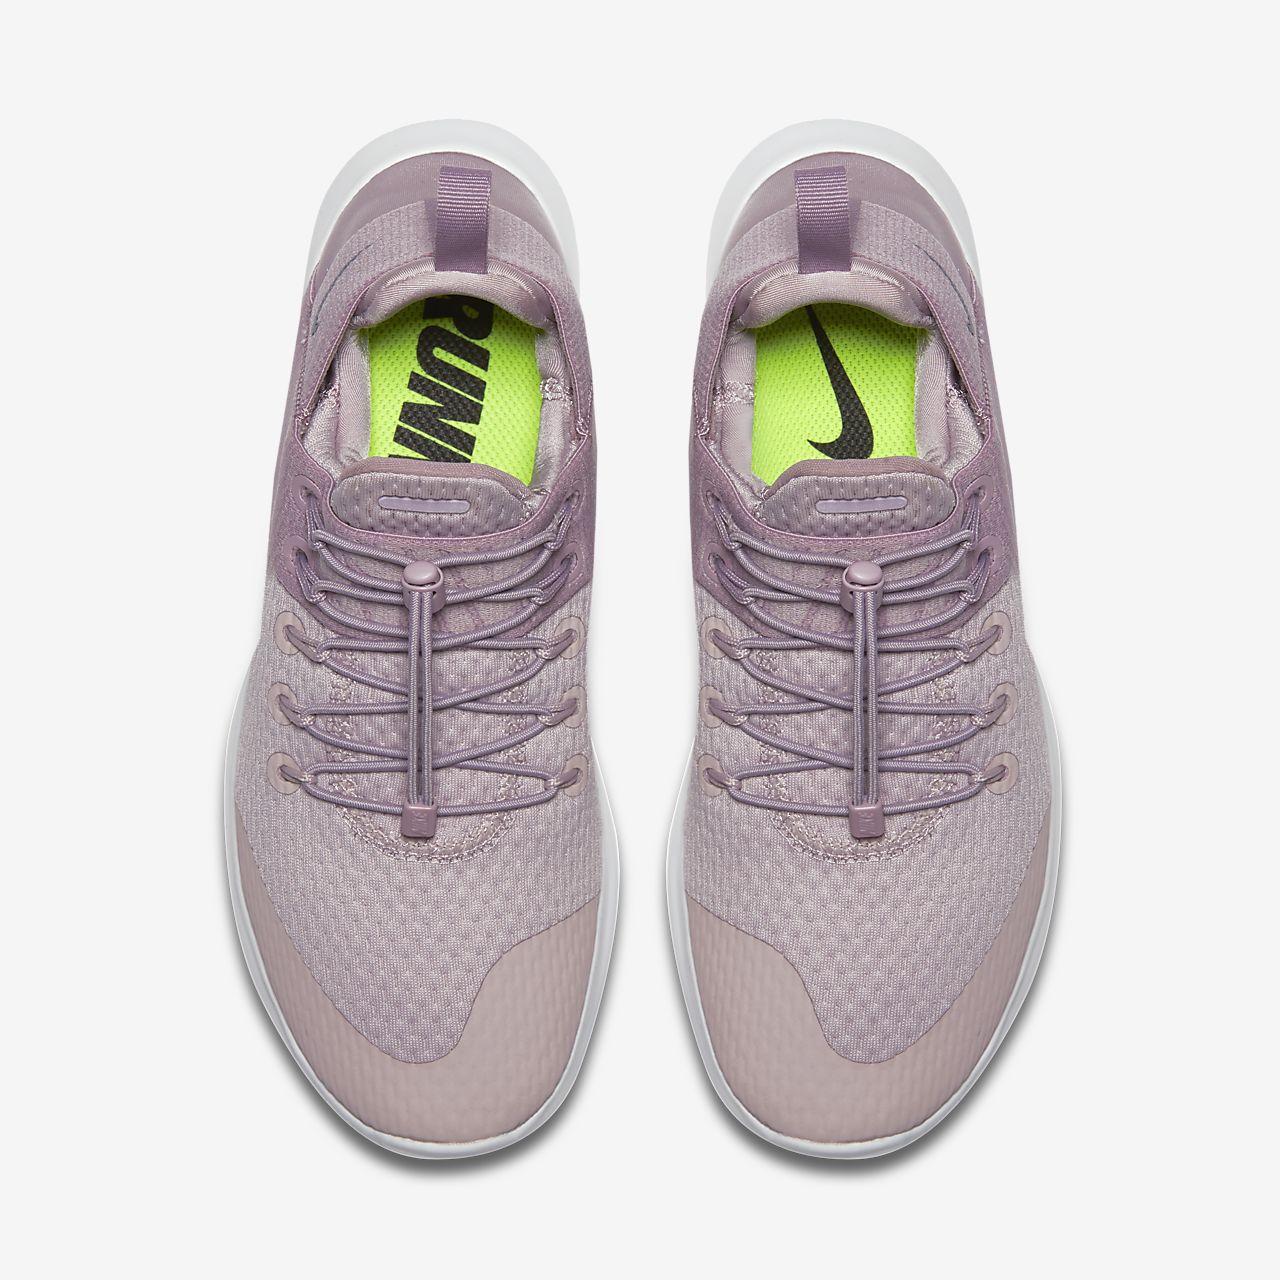 Nike Free Run Femmes Shorts De Vélo De Banlieue jeu SAST seDlr2Gd